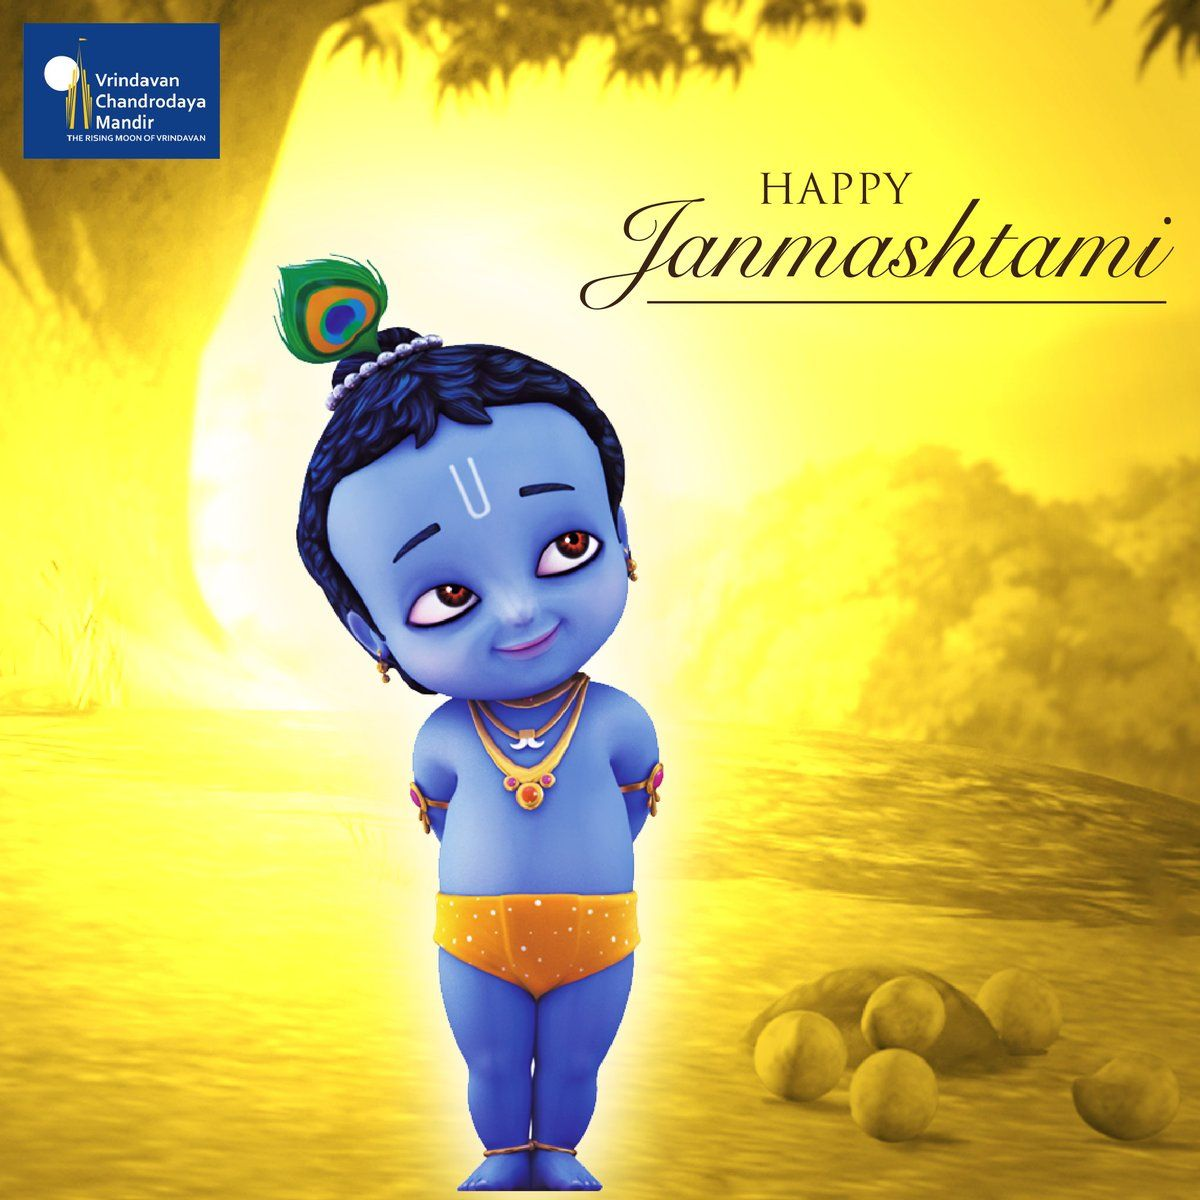 The Divine Lordkrishna Janmashtami 2016 Celebrate Janmashtami With Natkhat Krishna Happyjanmashtami Cute Krishna Baby Krishna Little Krishna